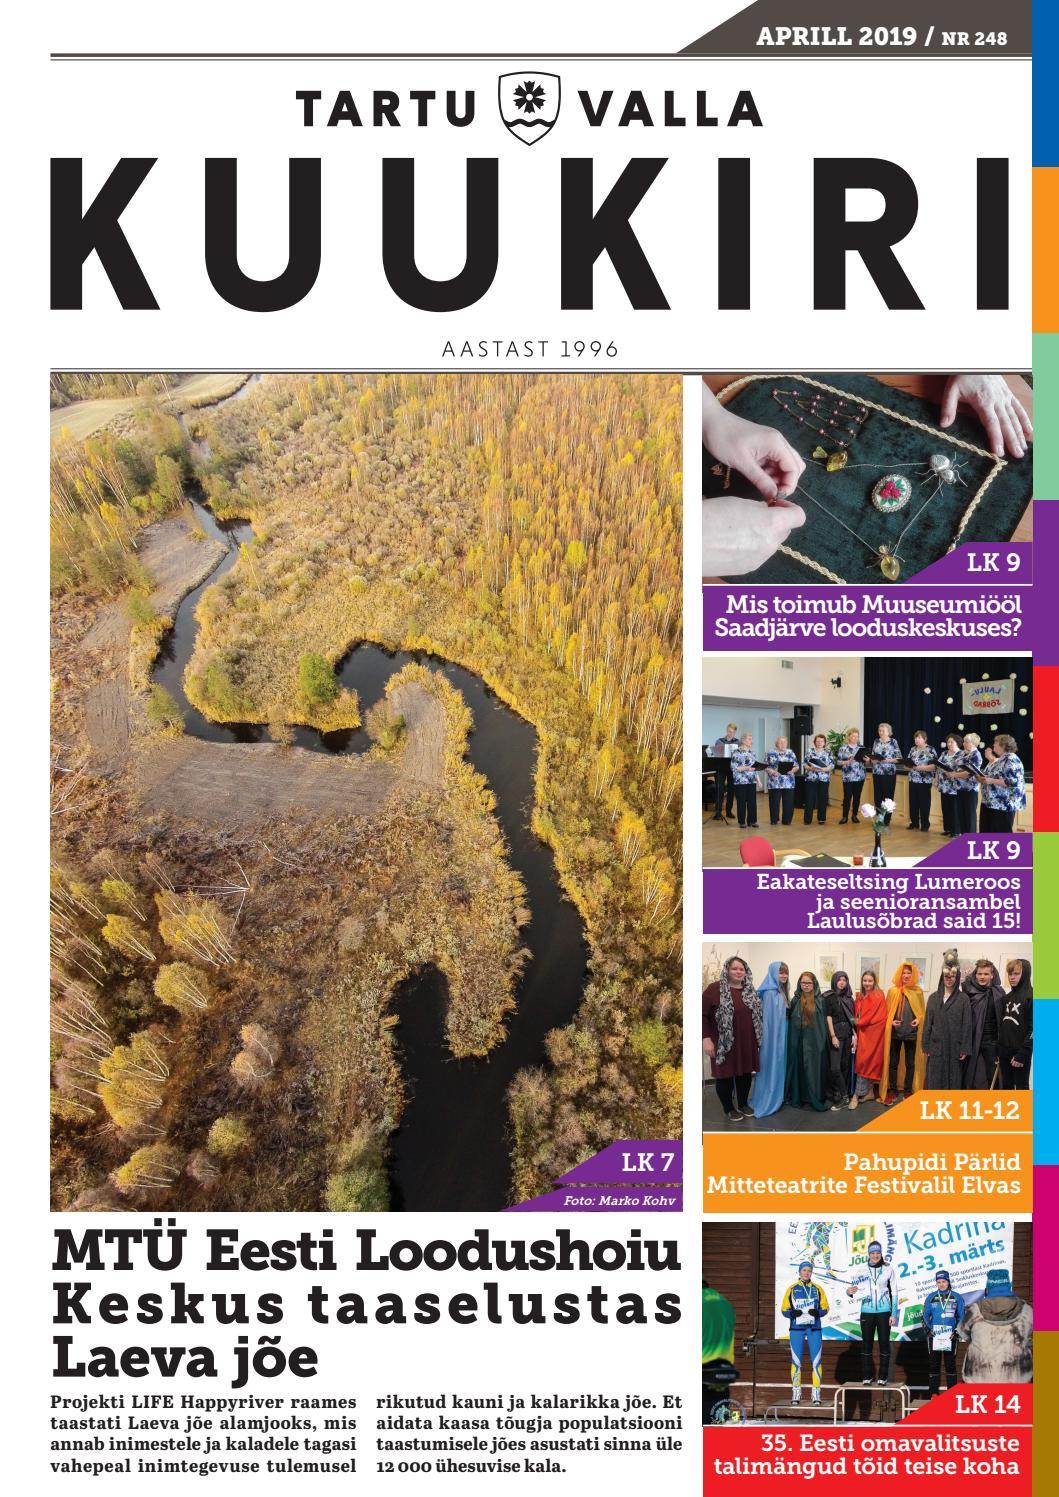 629250417f6 Tartu Valla Kuukiri (248) Aprill 2019 by Tartu Valla Kuukiri - issuu